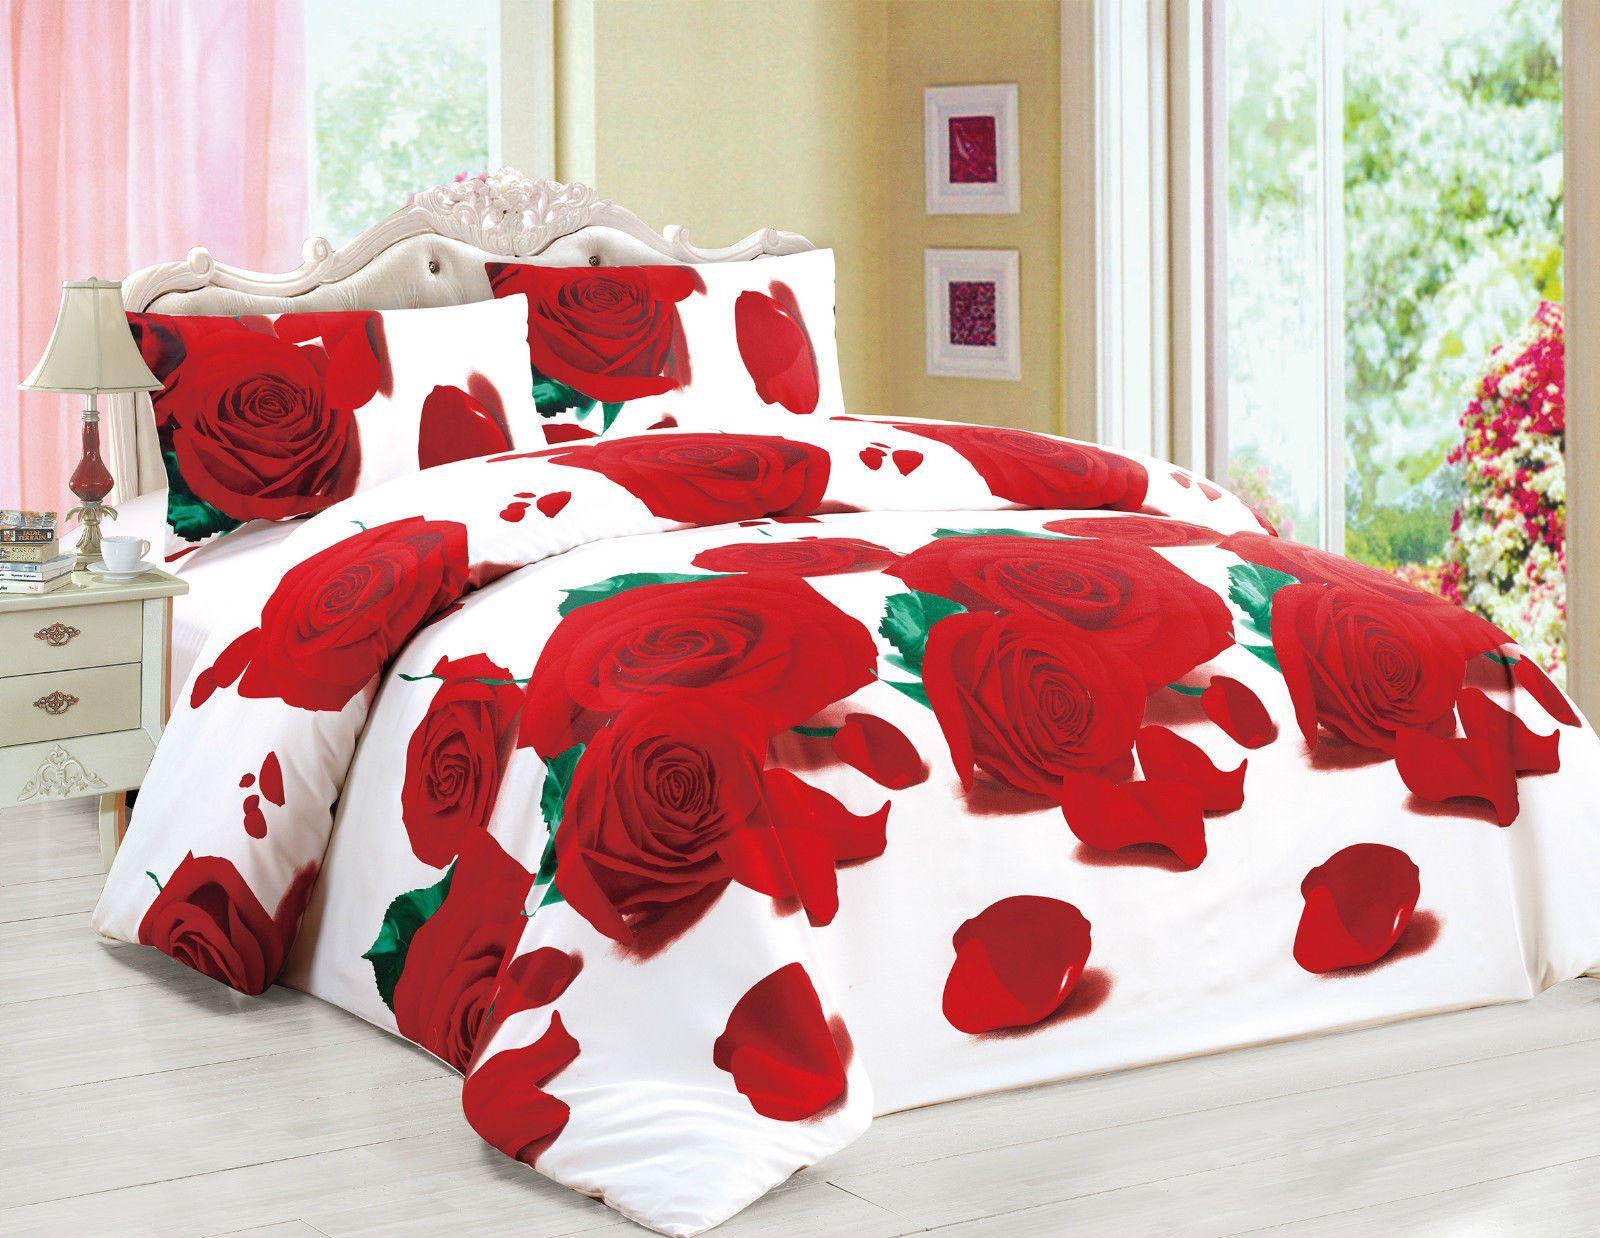 3d effect bedding set floral animal print duvet cover fitted sheet pillows cases ebay. Black Bedroom Furniture Sets. Home Design Ideas